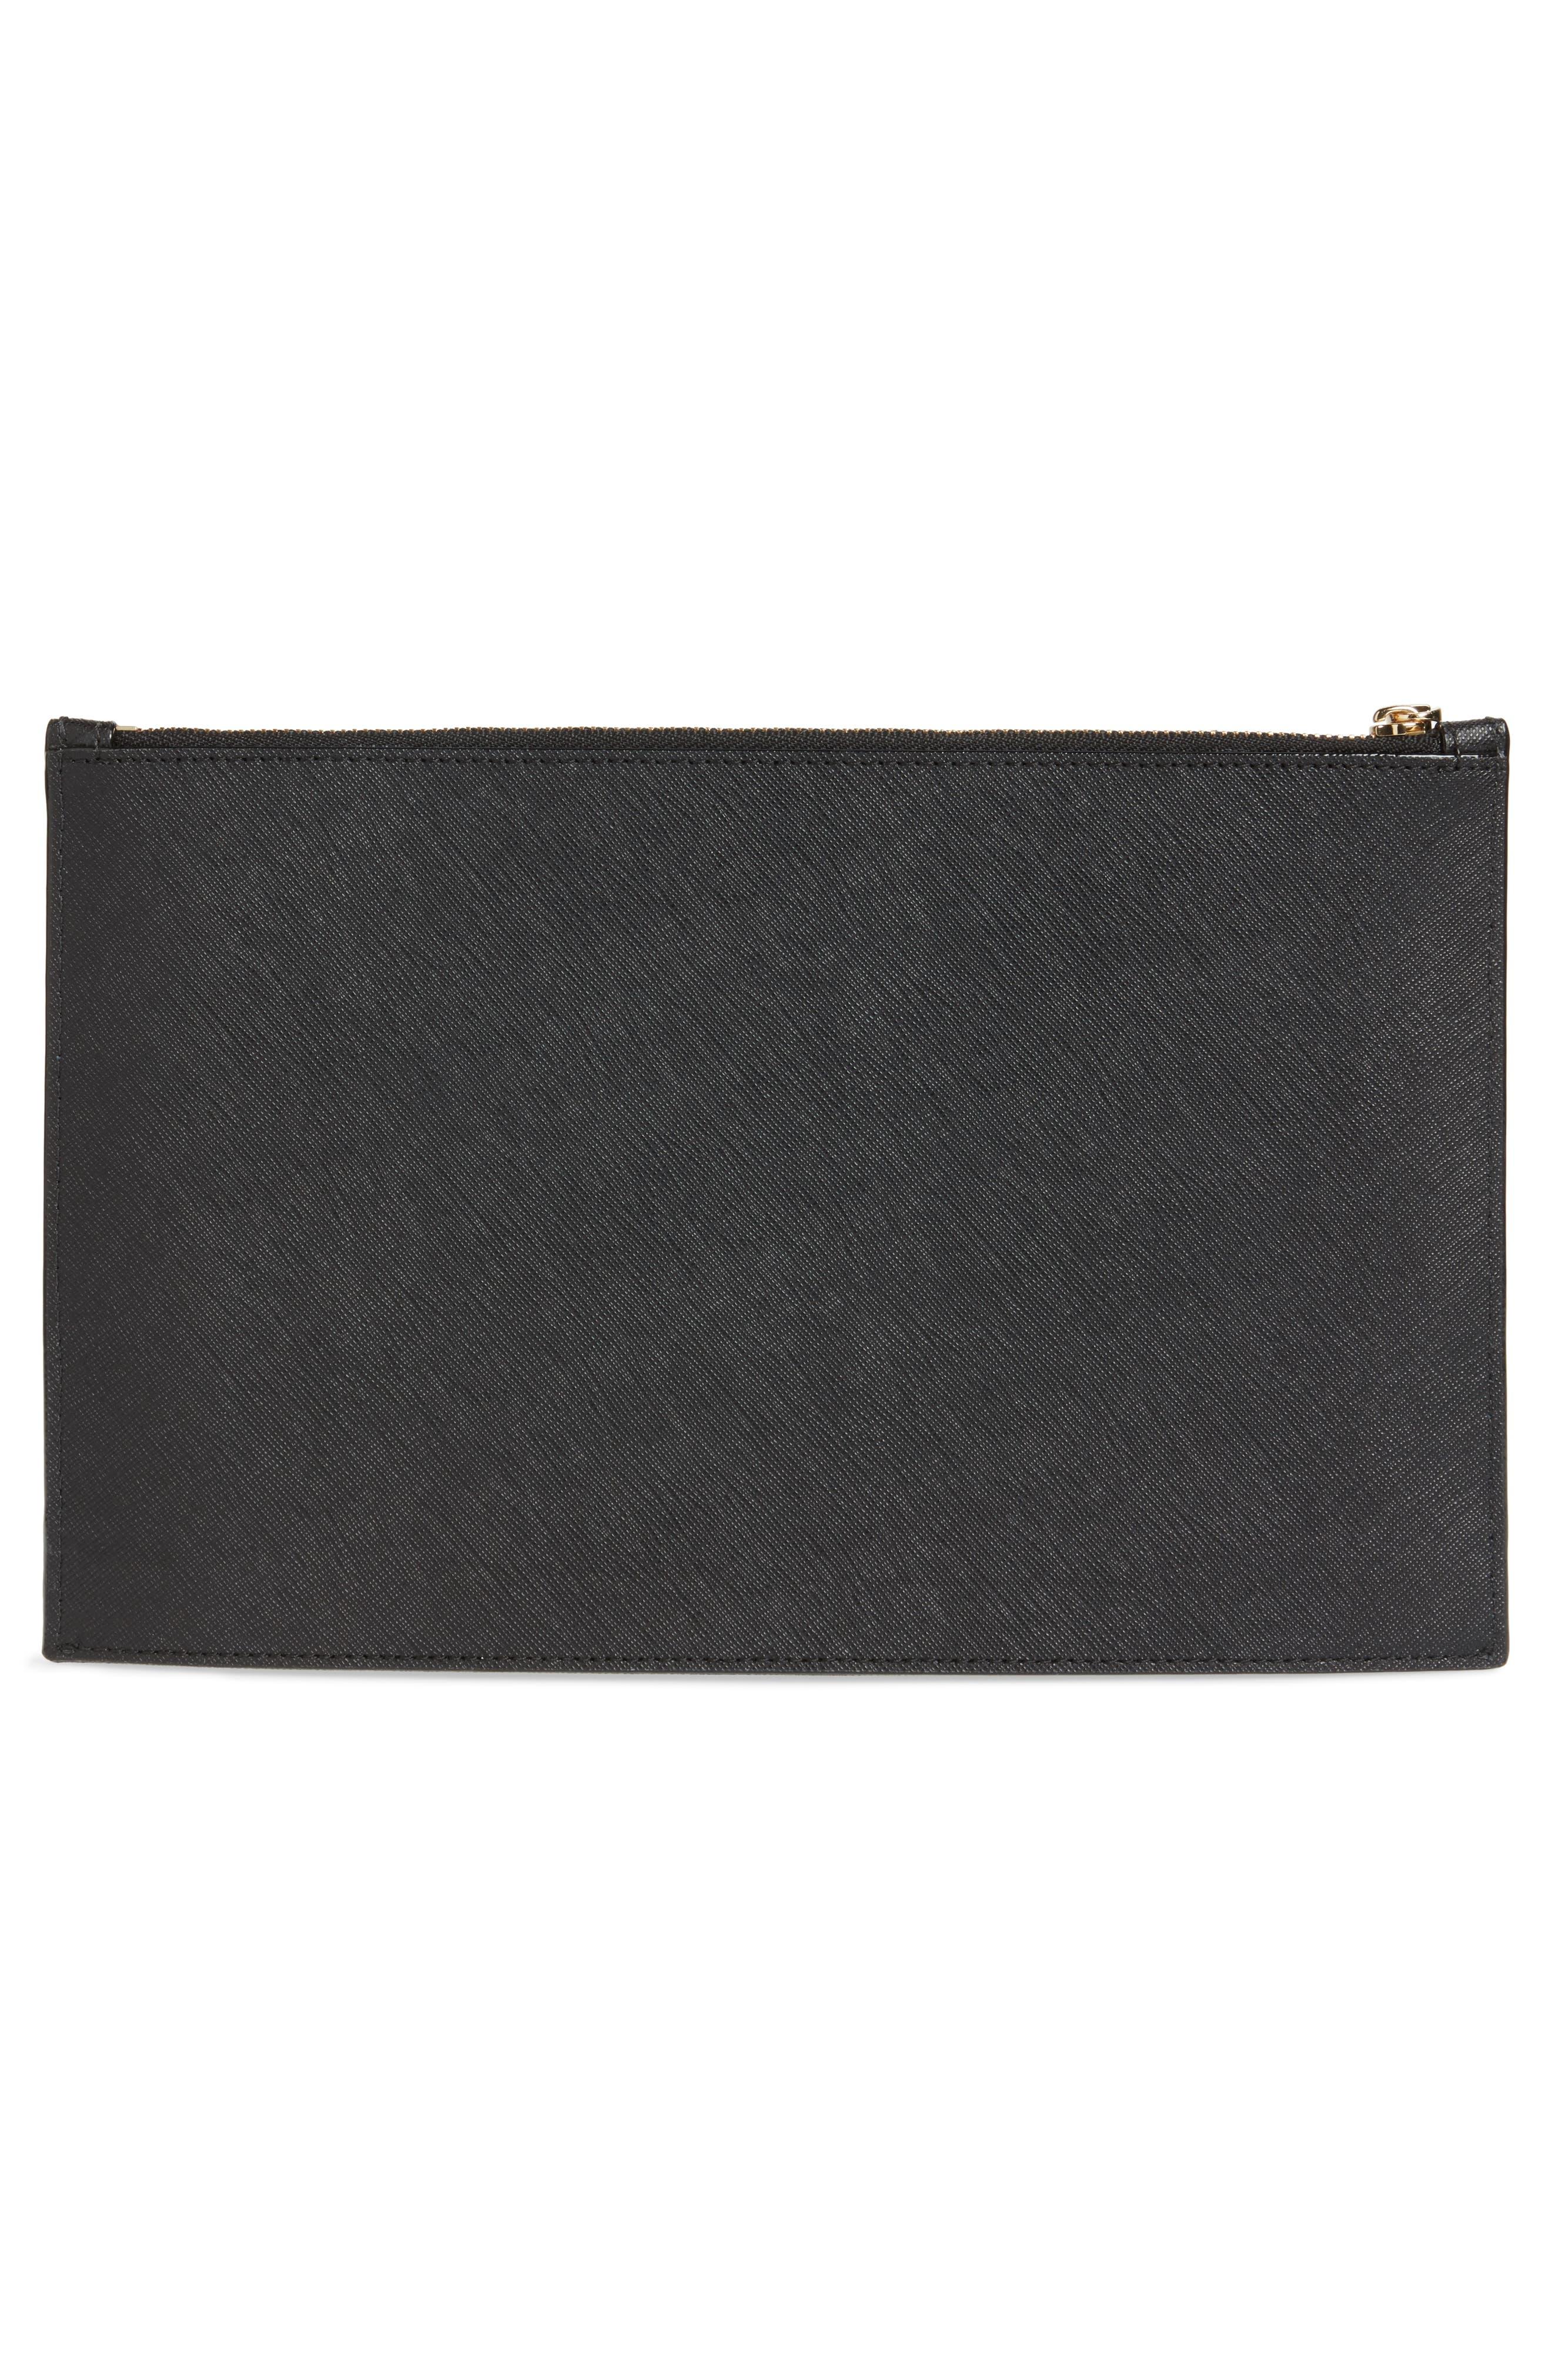 cameron street lilia leather clutch,                             Alternate thumbnail 3, color,                             Black